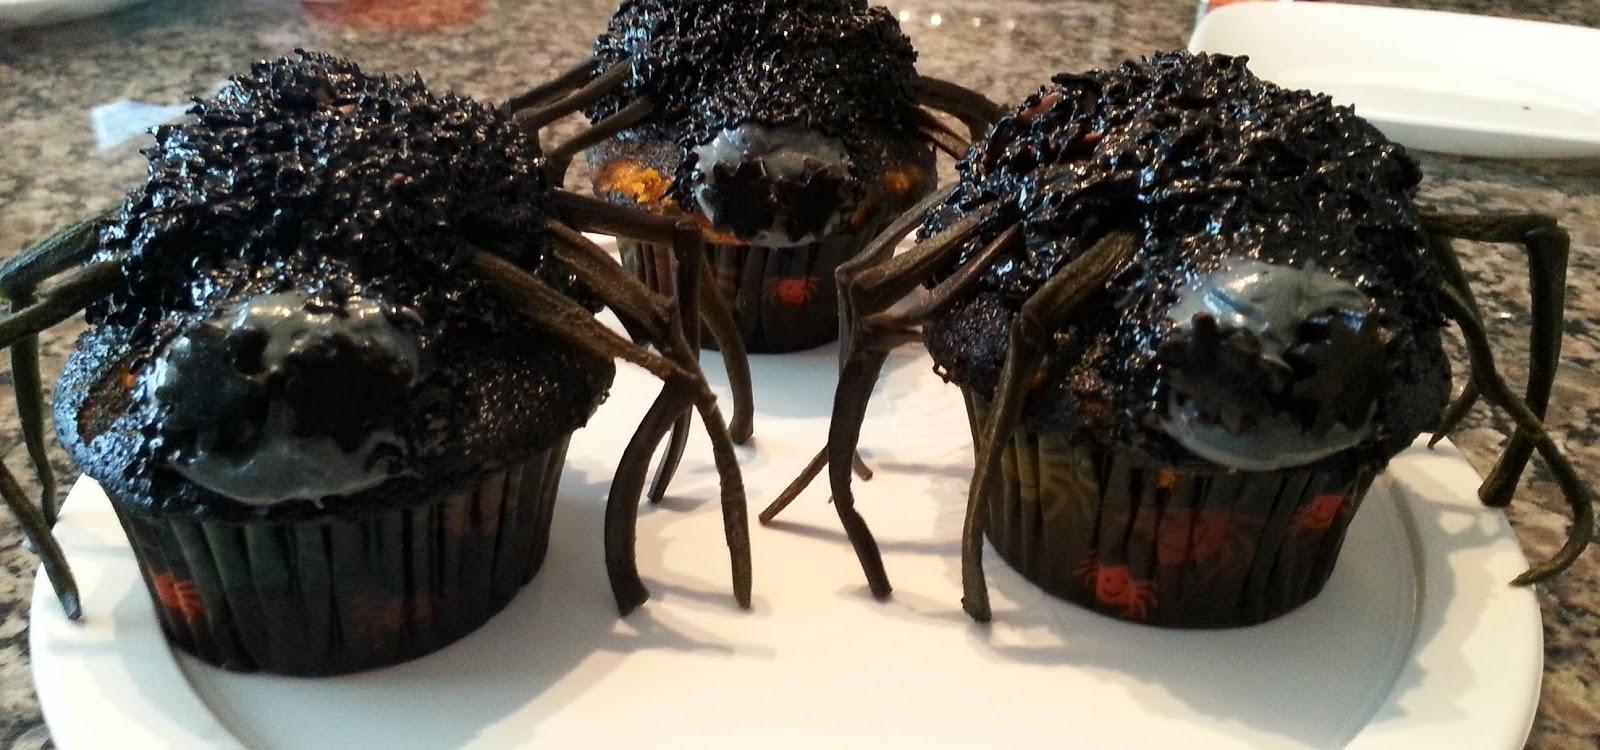 Creepy Halloween Spider Cupcakes ideas